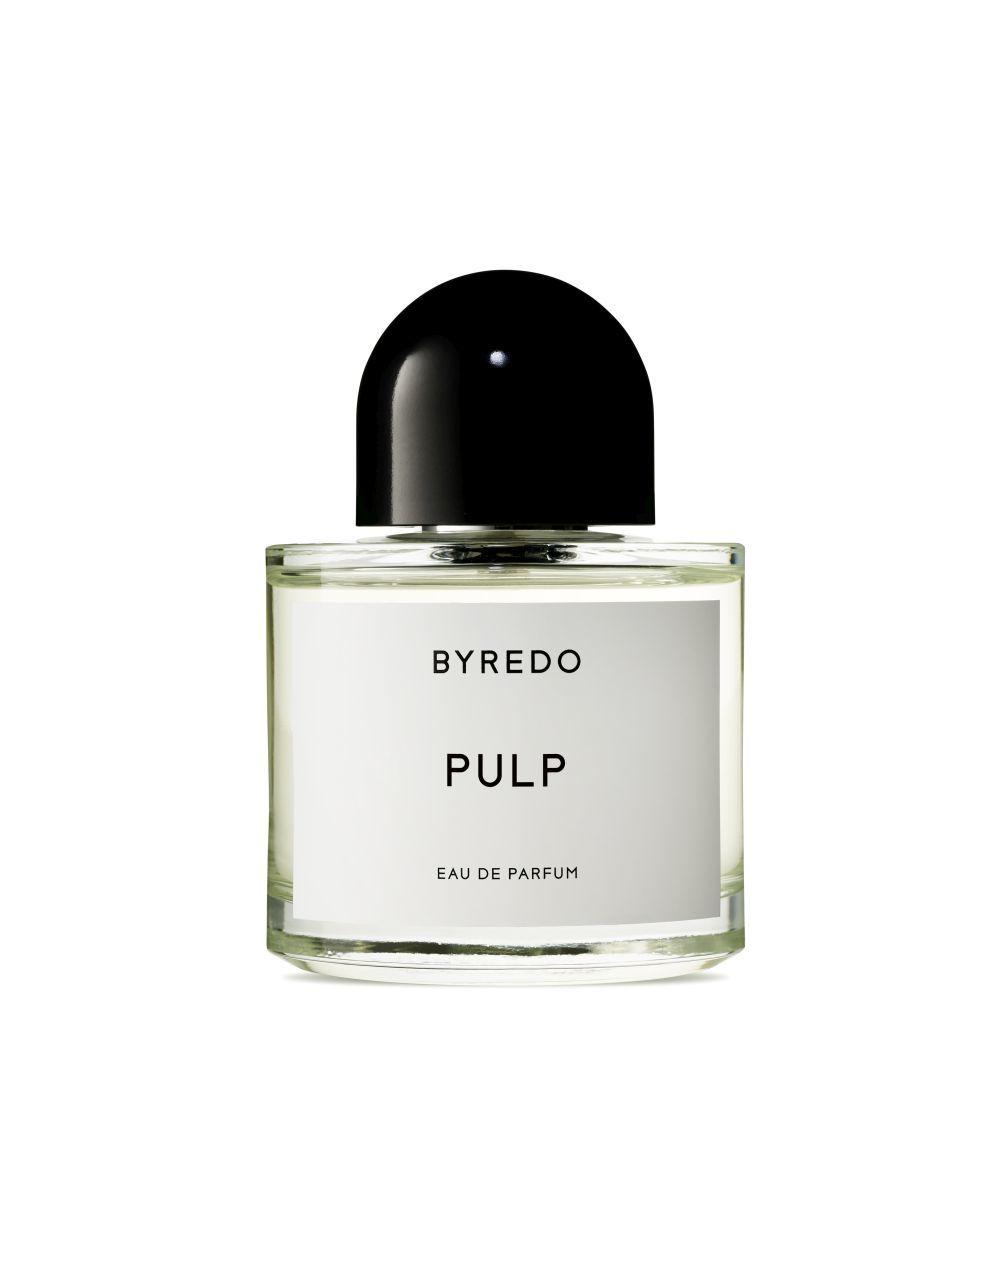 Pulp, Byredo.